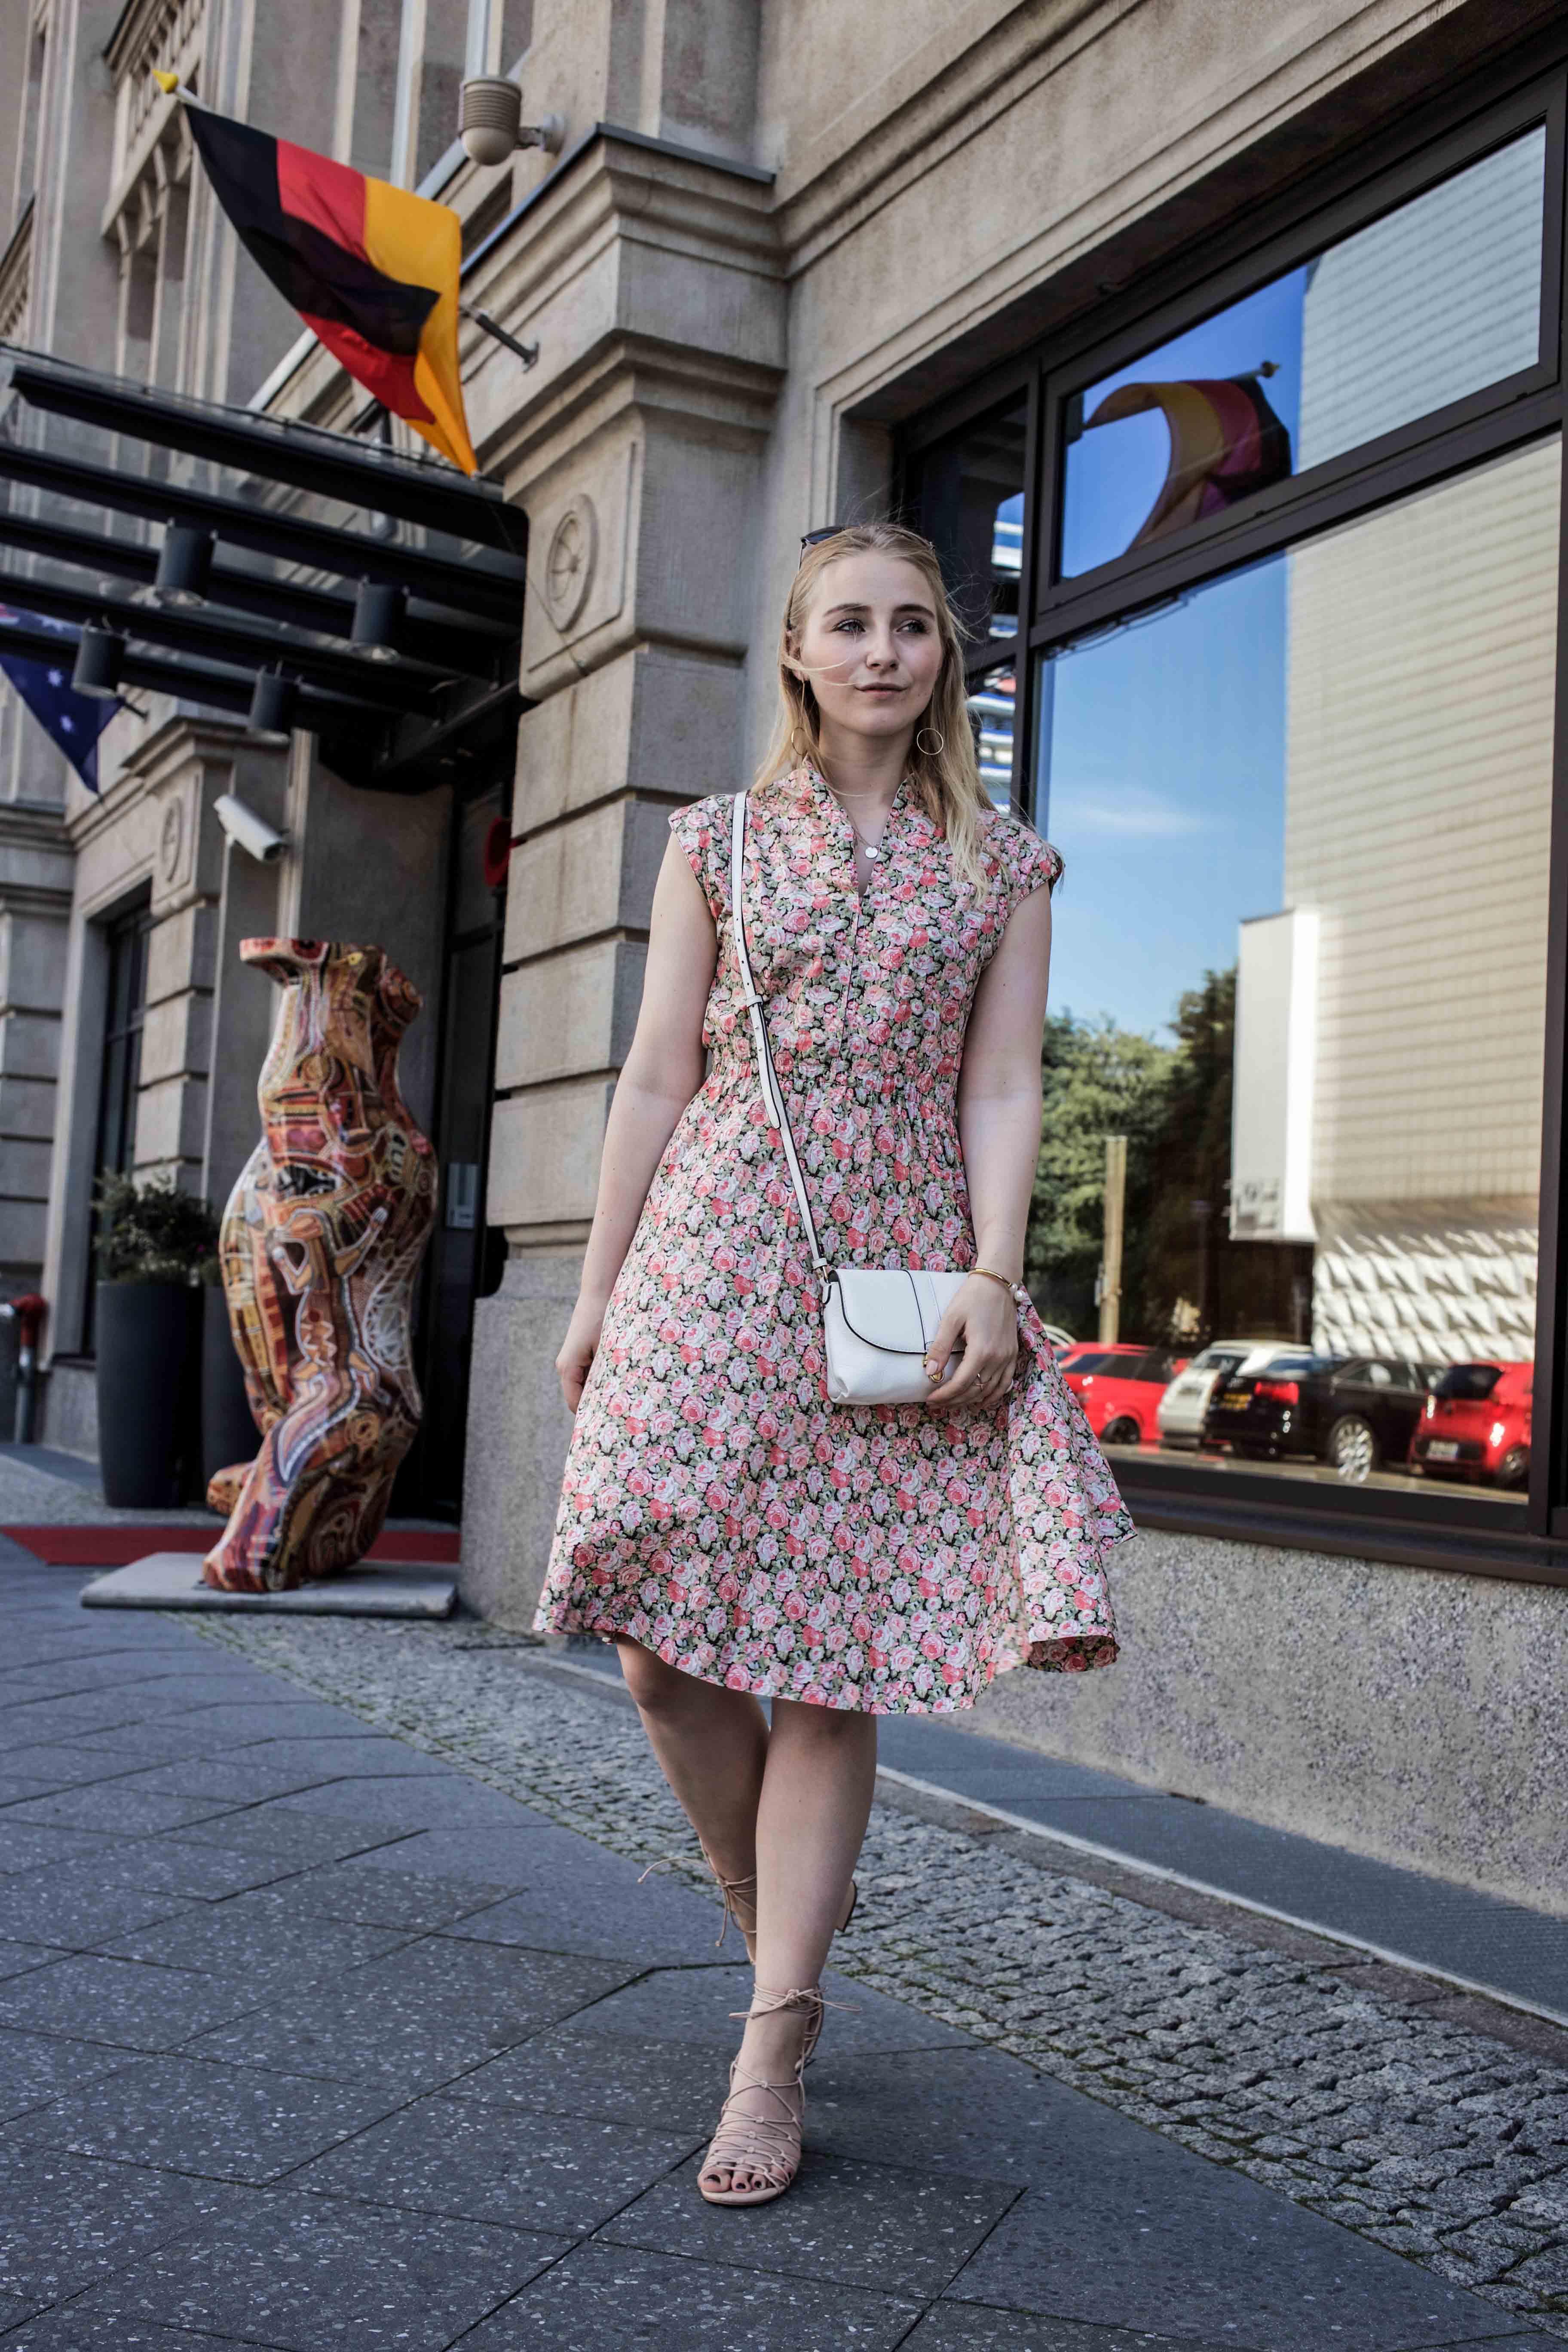 80er-jahre-blumenkleid-paris-vintage-lover-second-hand-outfit-look-fashionblogger-modeblog_7740